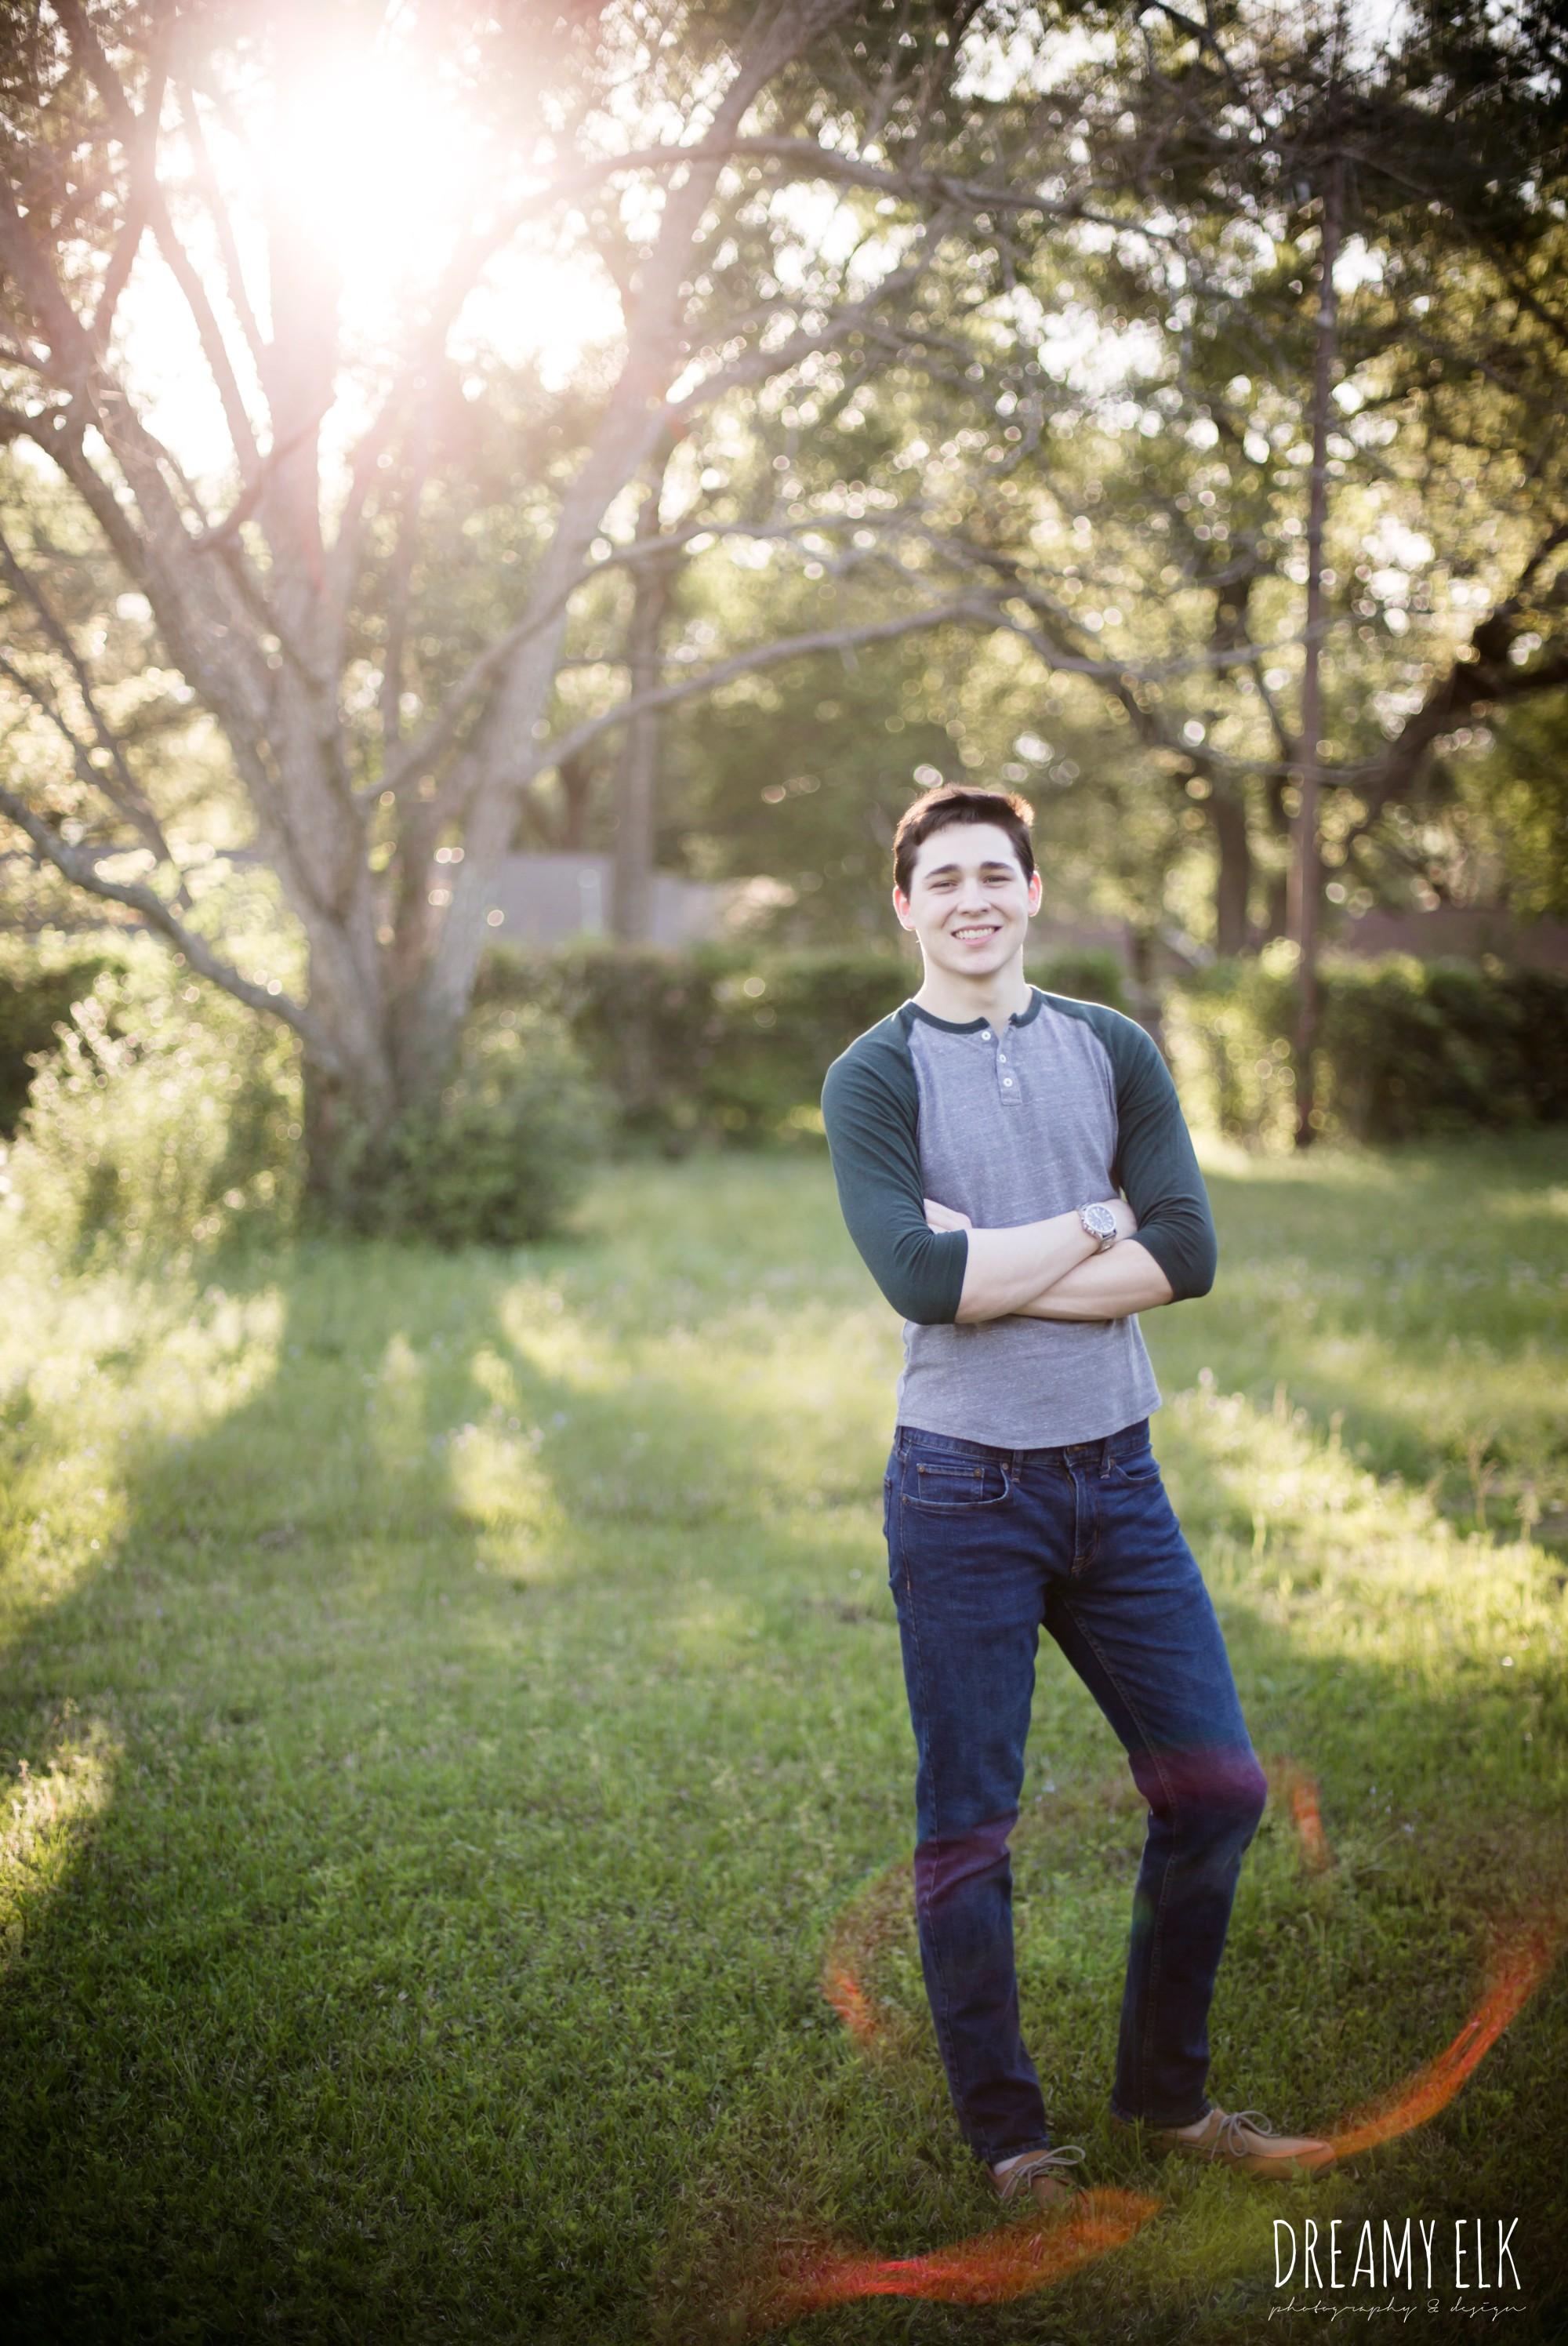 spring, march, high school senior boy, senior photo, tomball, texas {dreamy elk photography and design}